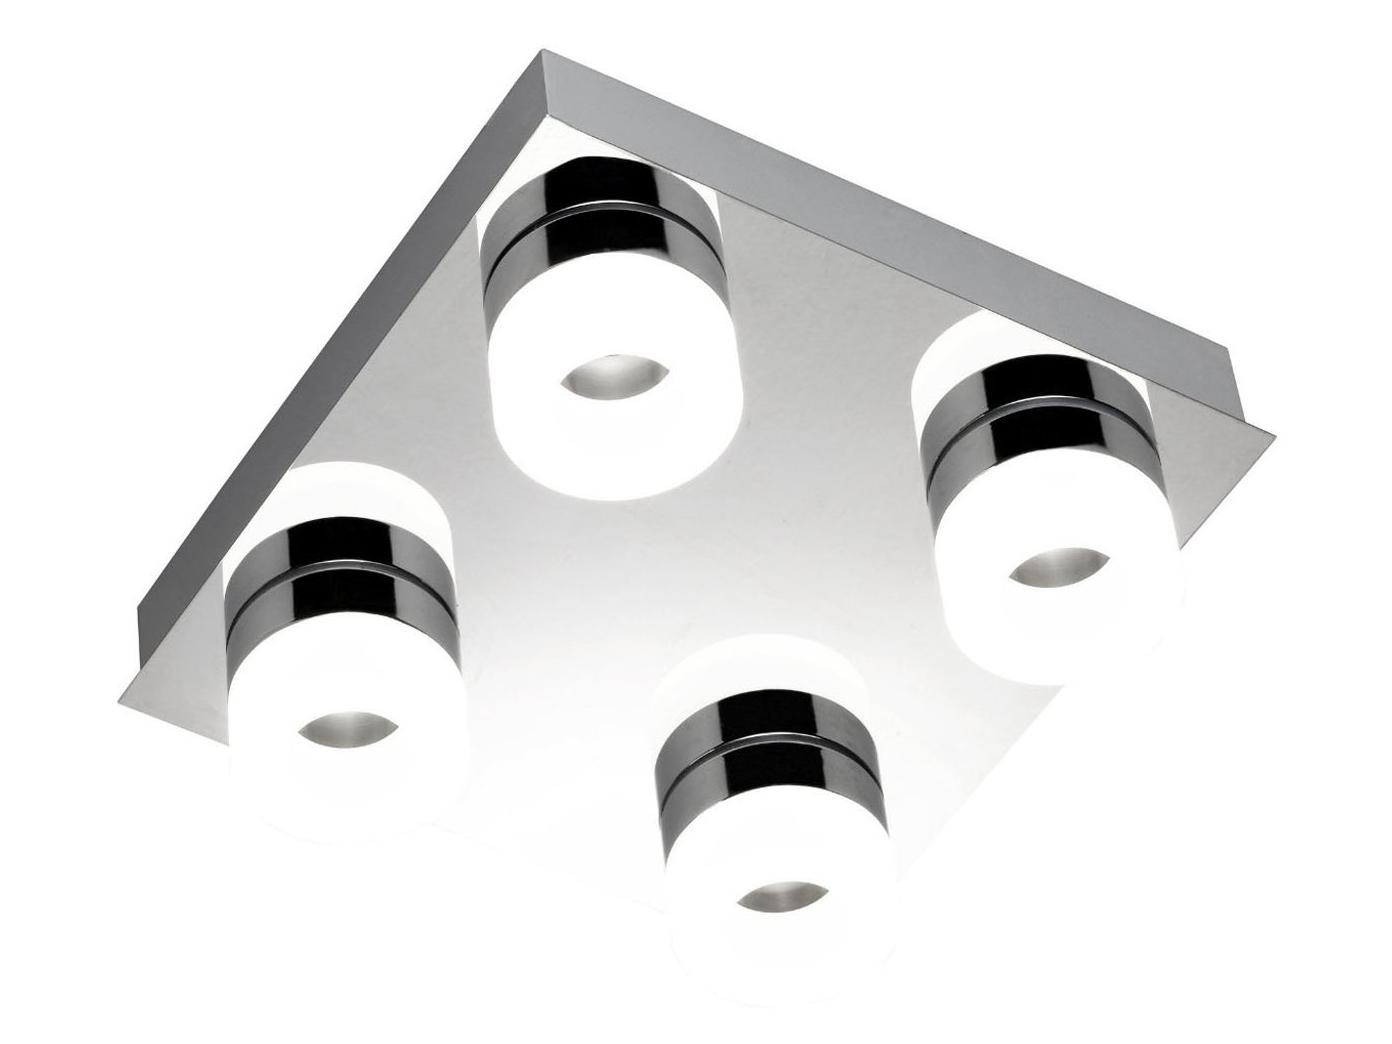 Plafoniere A Led Per Bagno : Plafoniera led per bagno cromo ip cm wofi luci